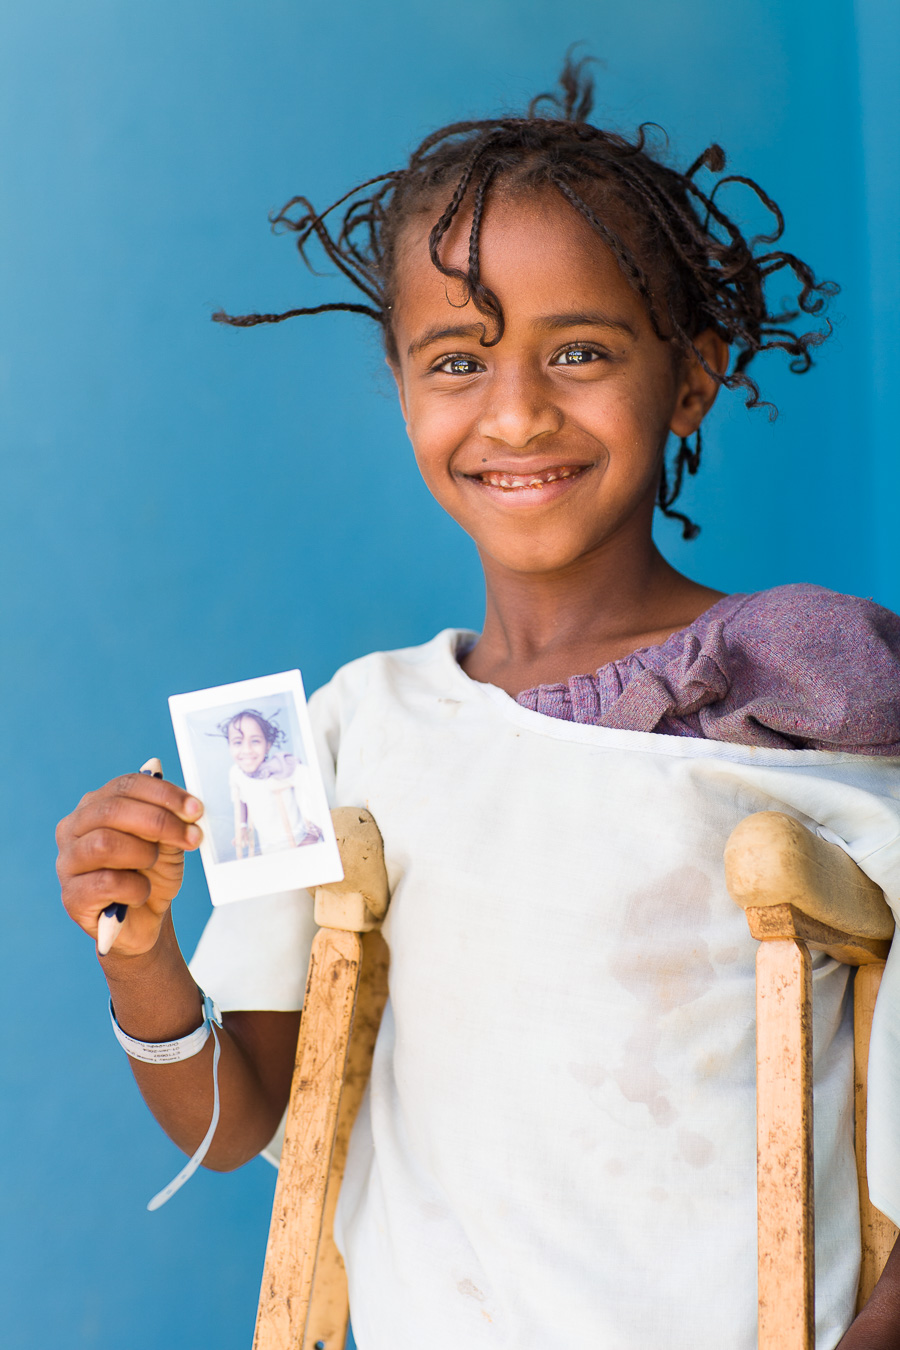 111204-Ethiopia-Addis-Ababa-140200-Gavin-Gough.jpg